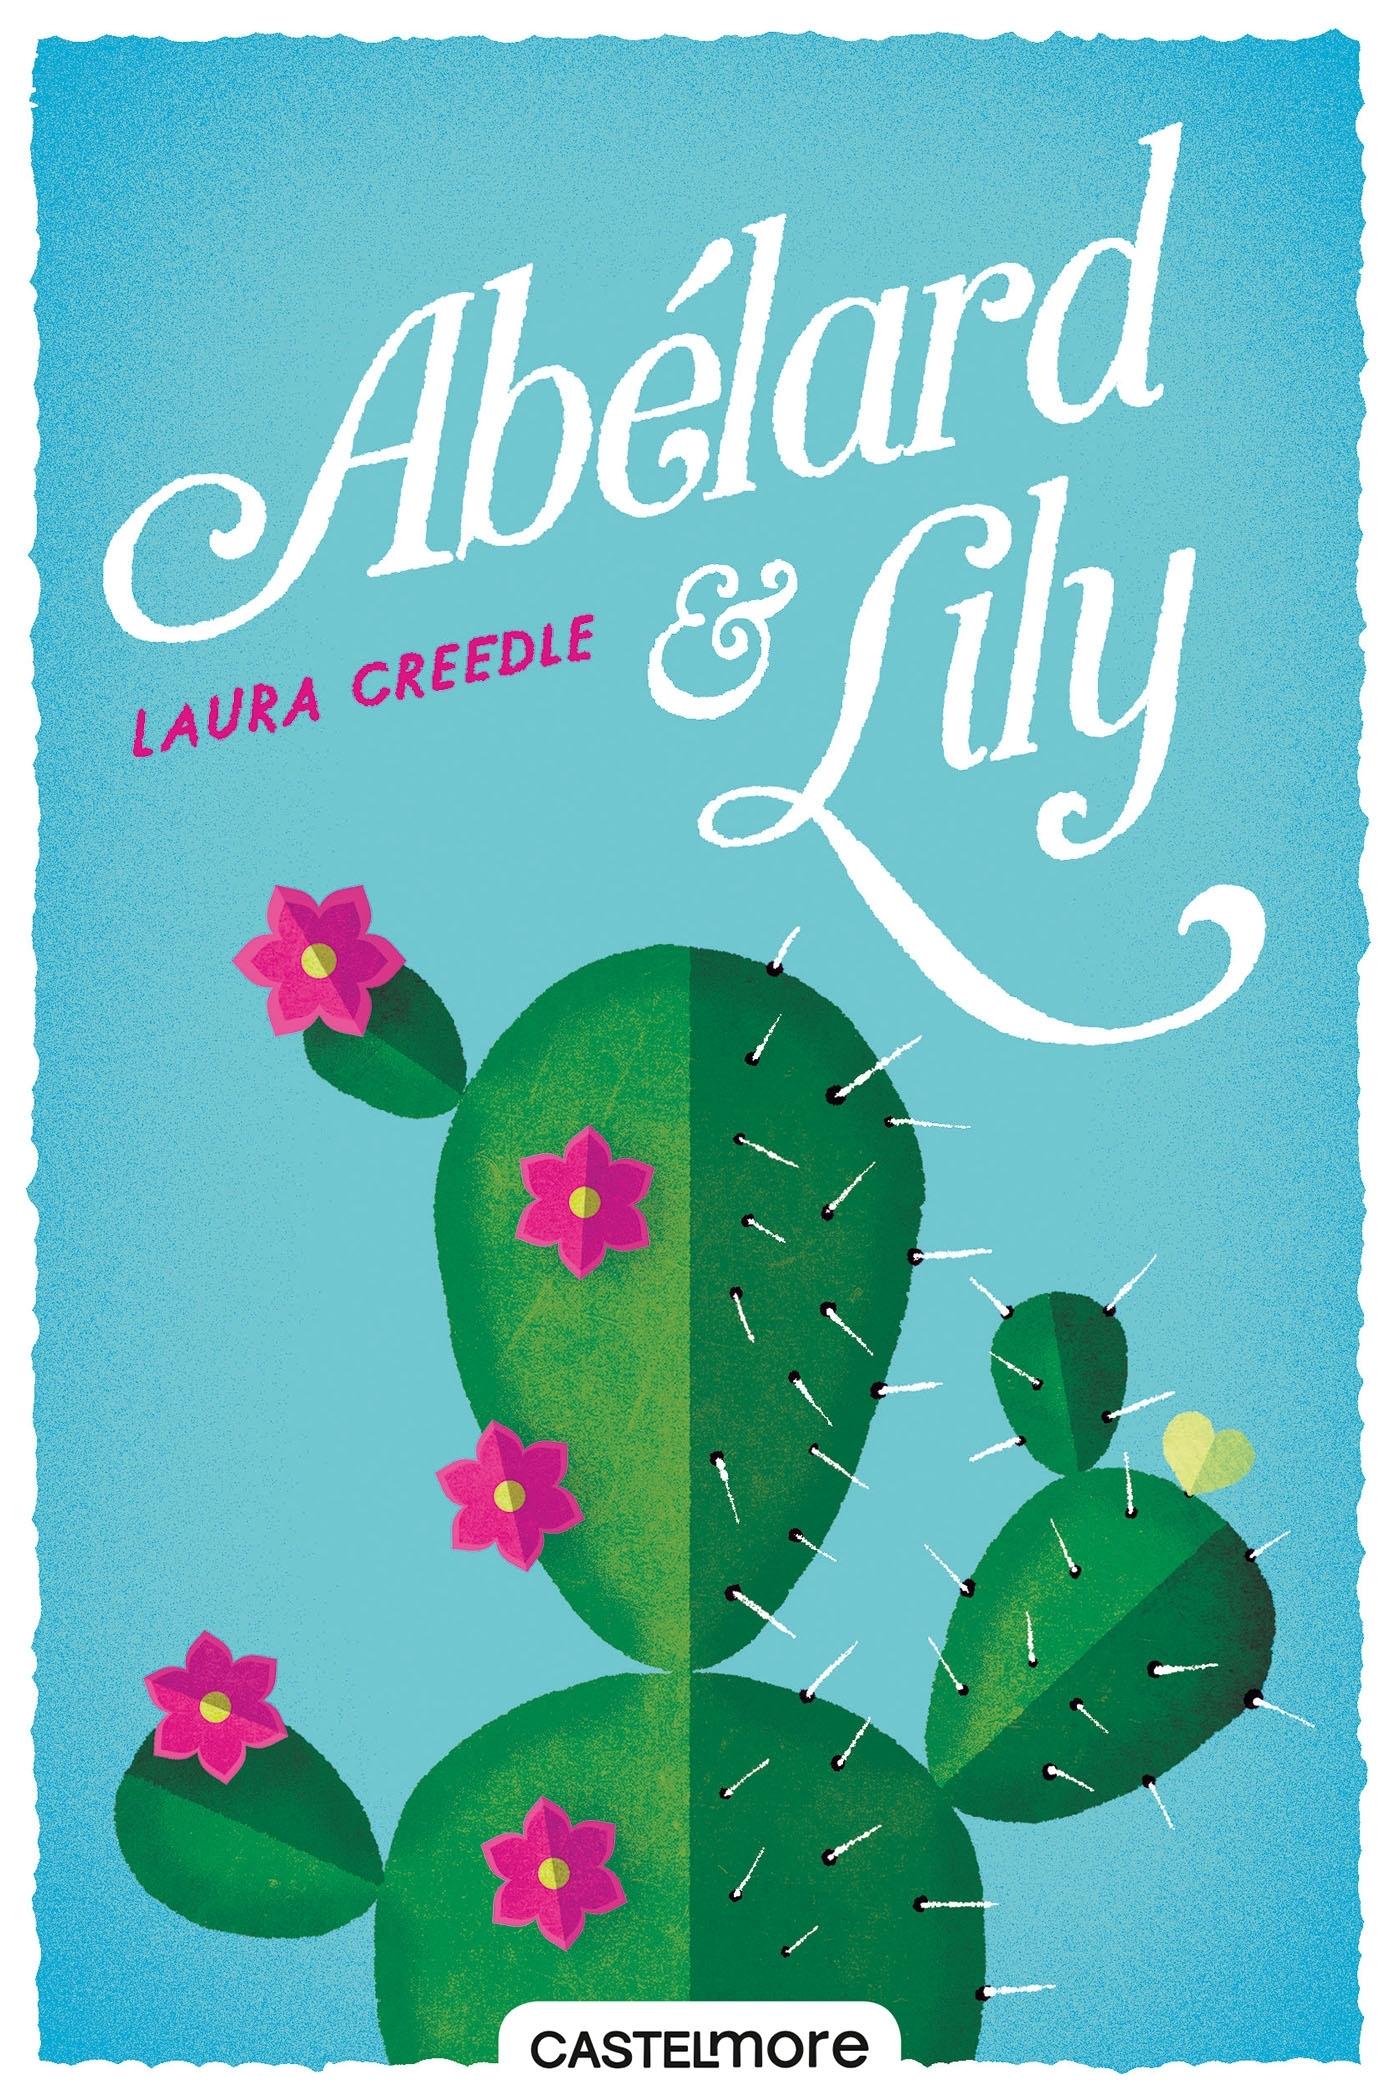 ABELARD & LILY